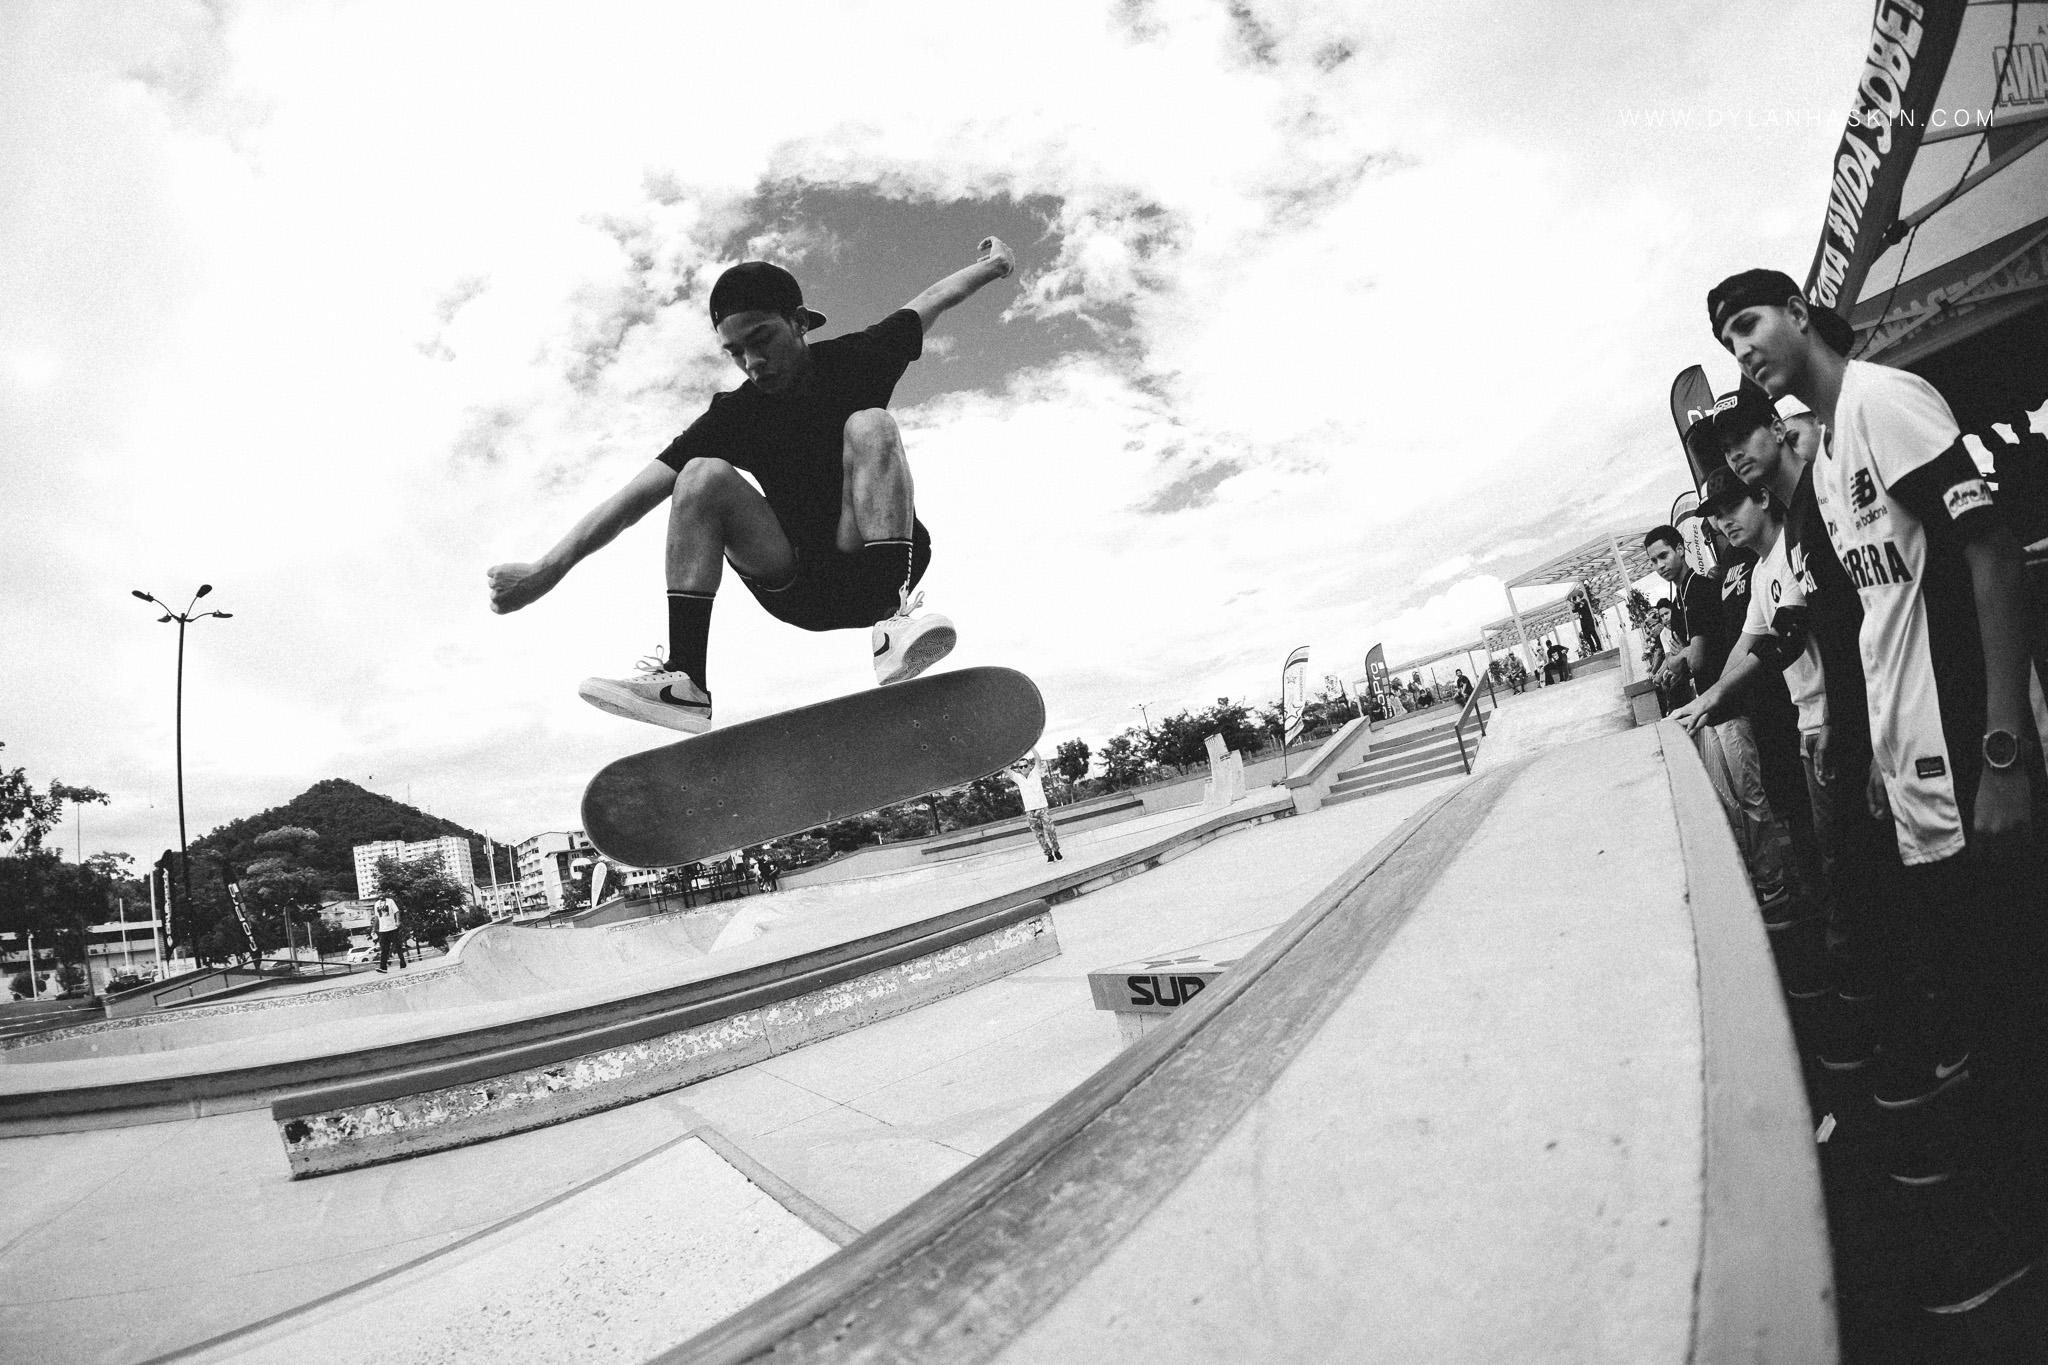 Panama Skate Competition